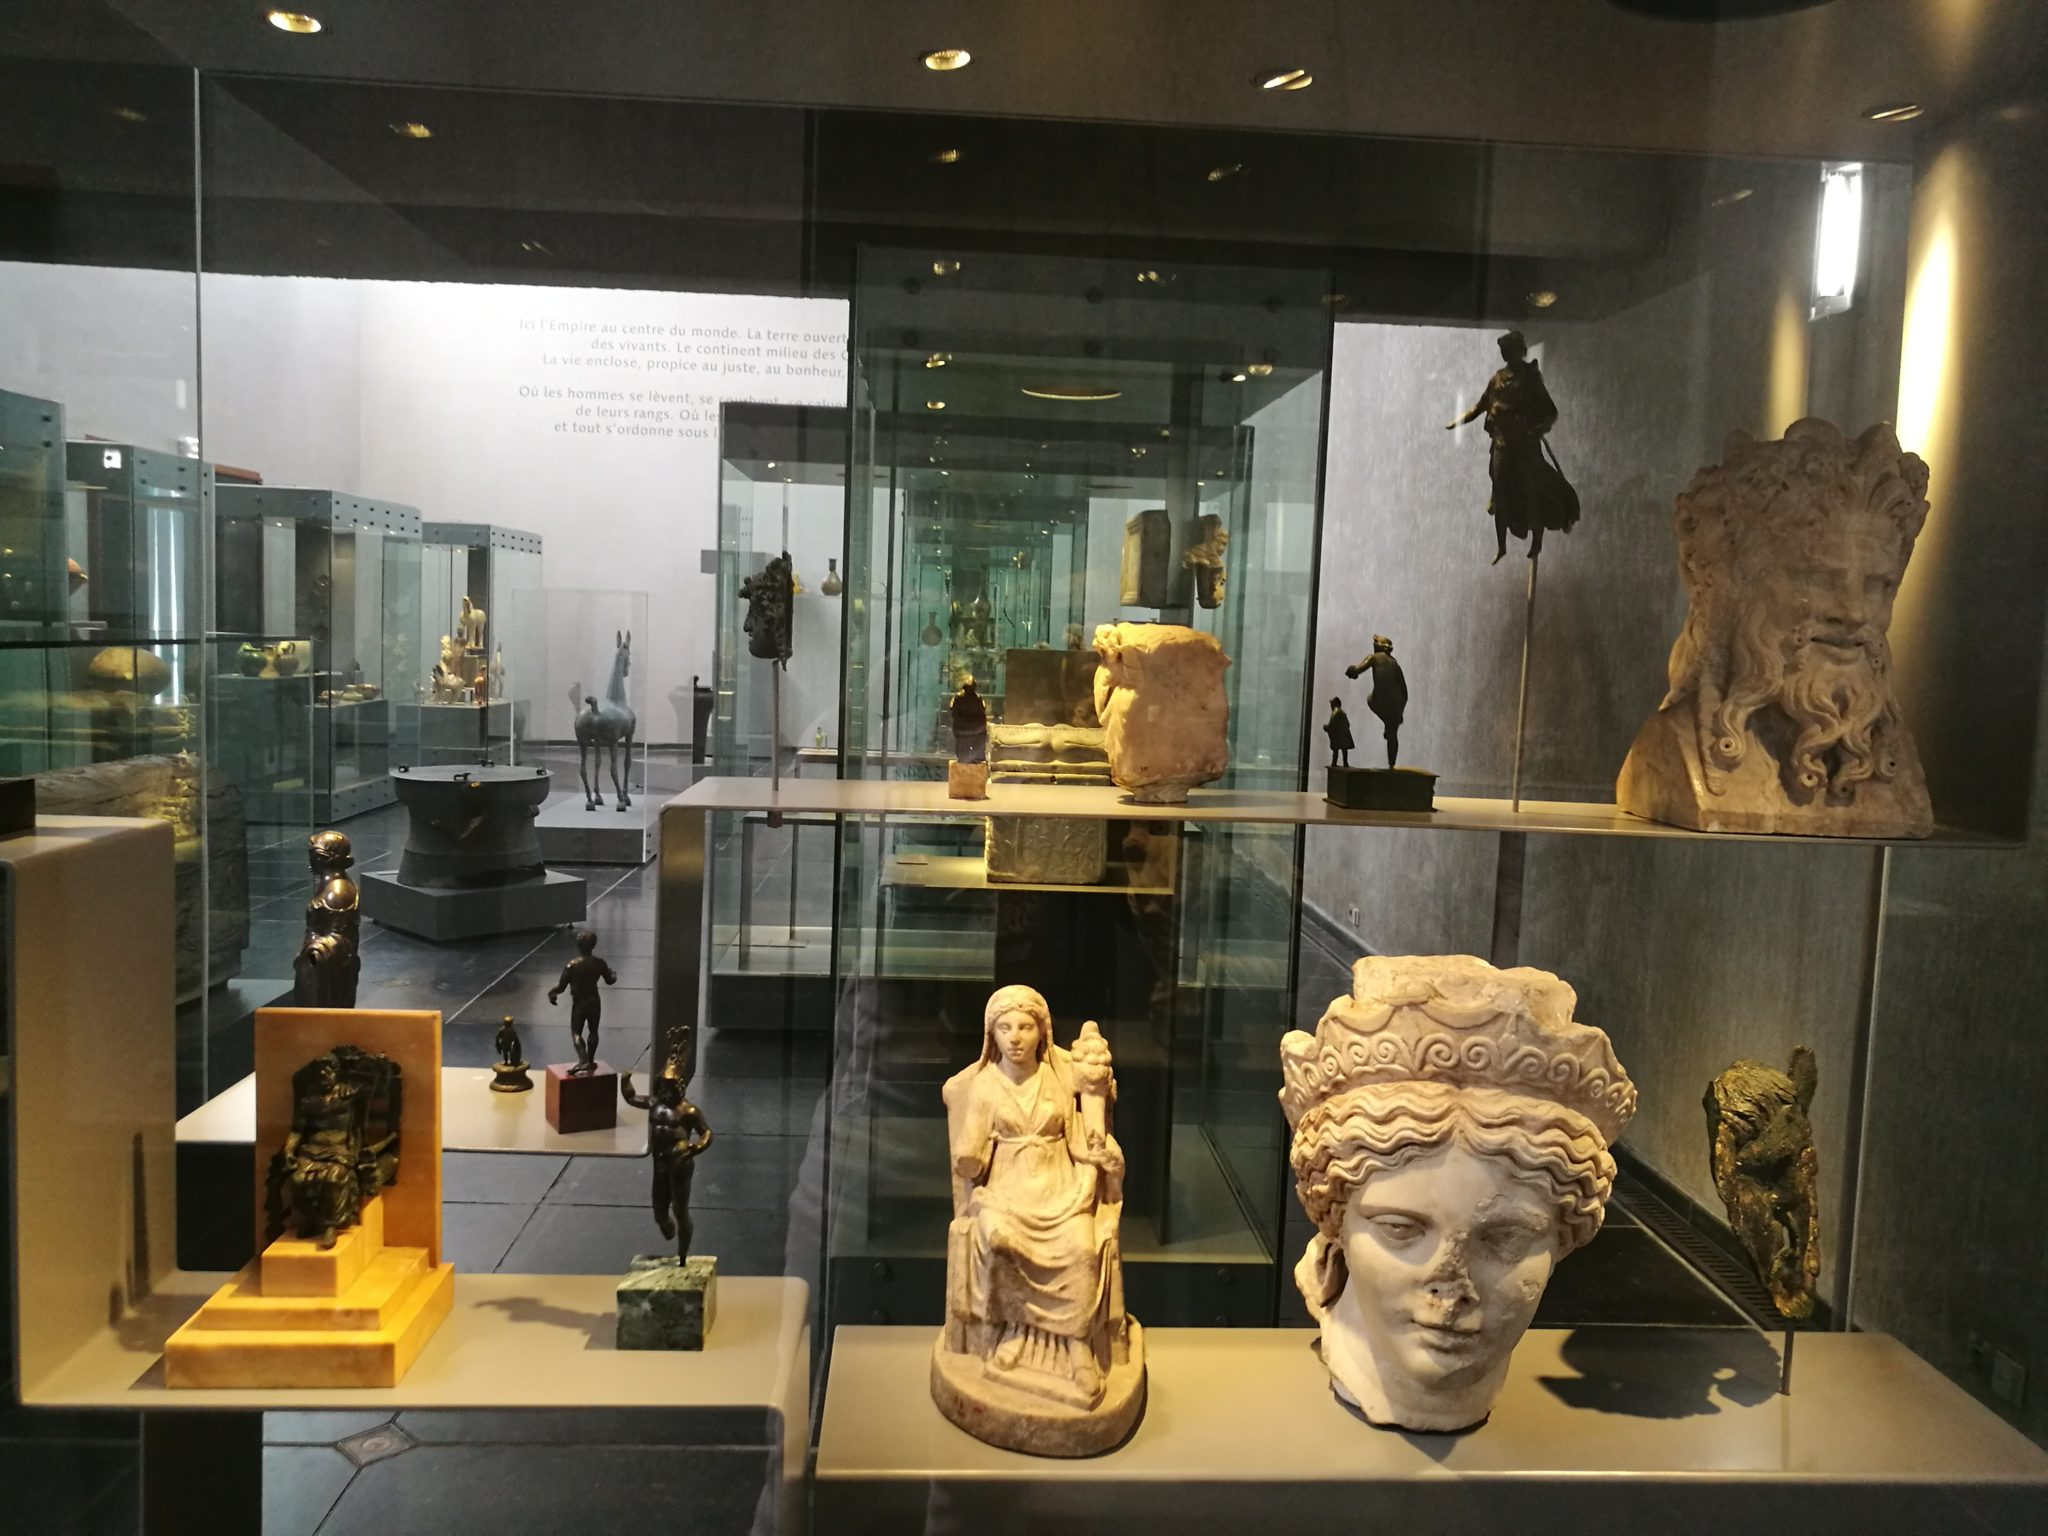 Kolekcja sztuki w Mariemont